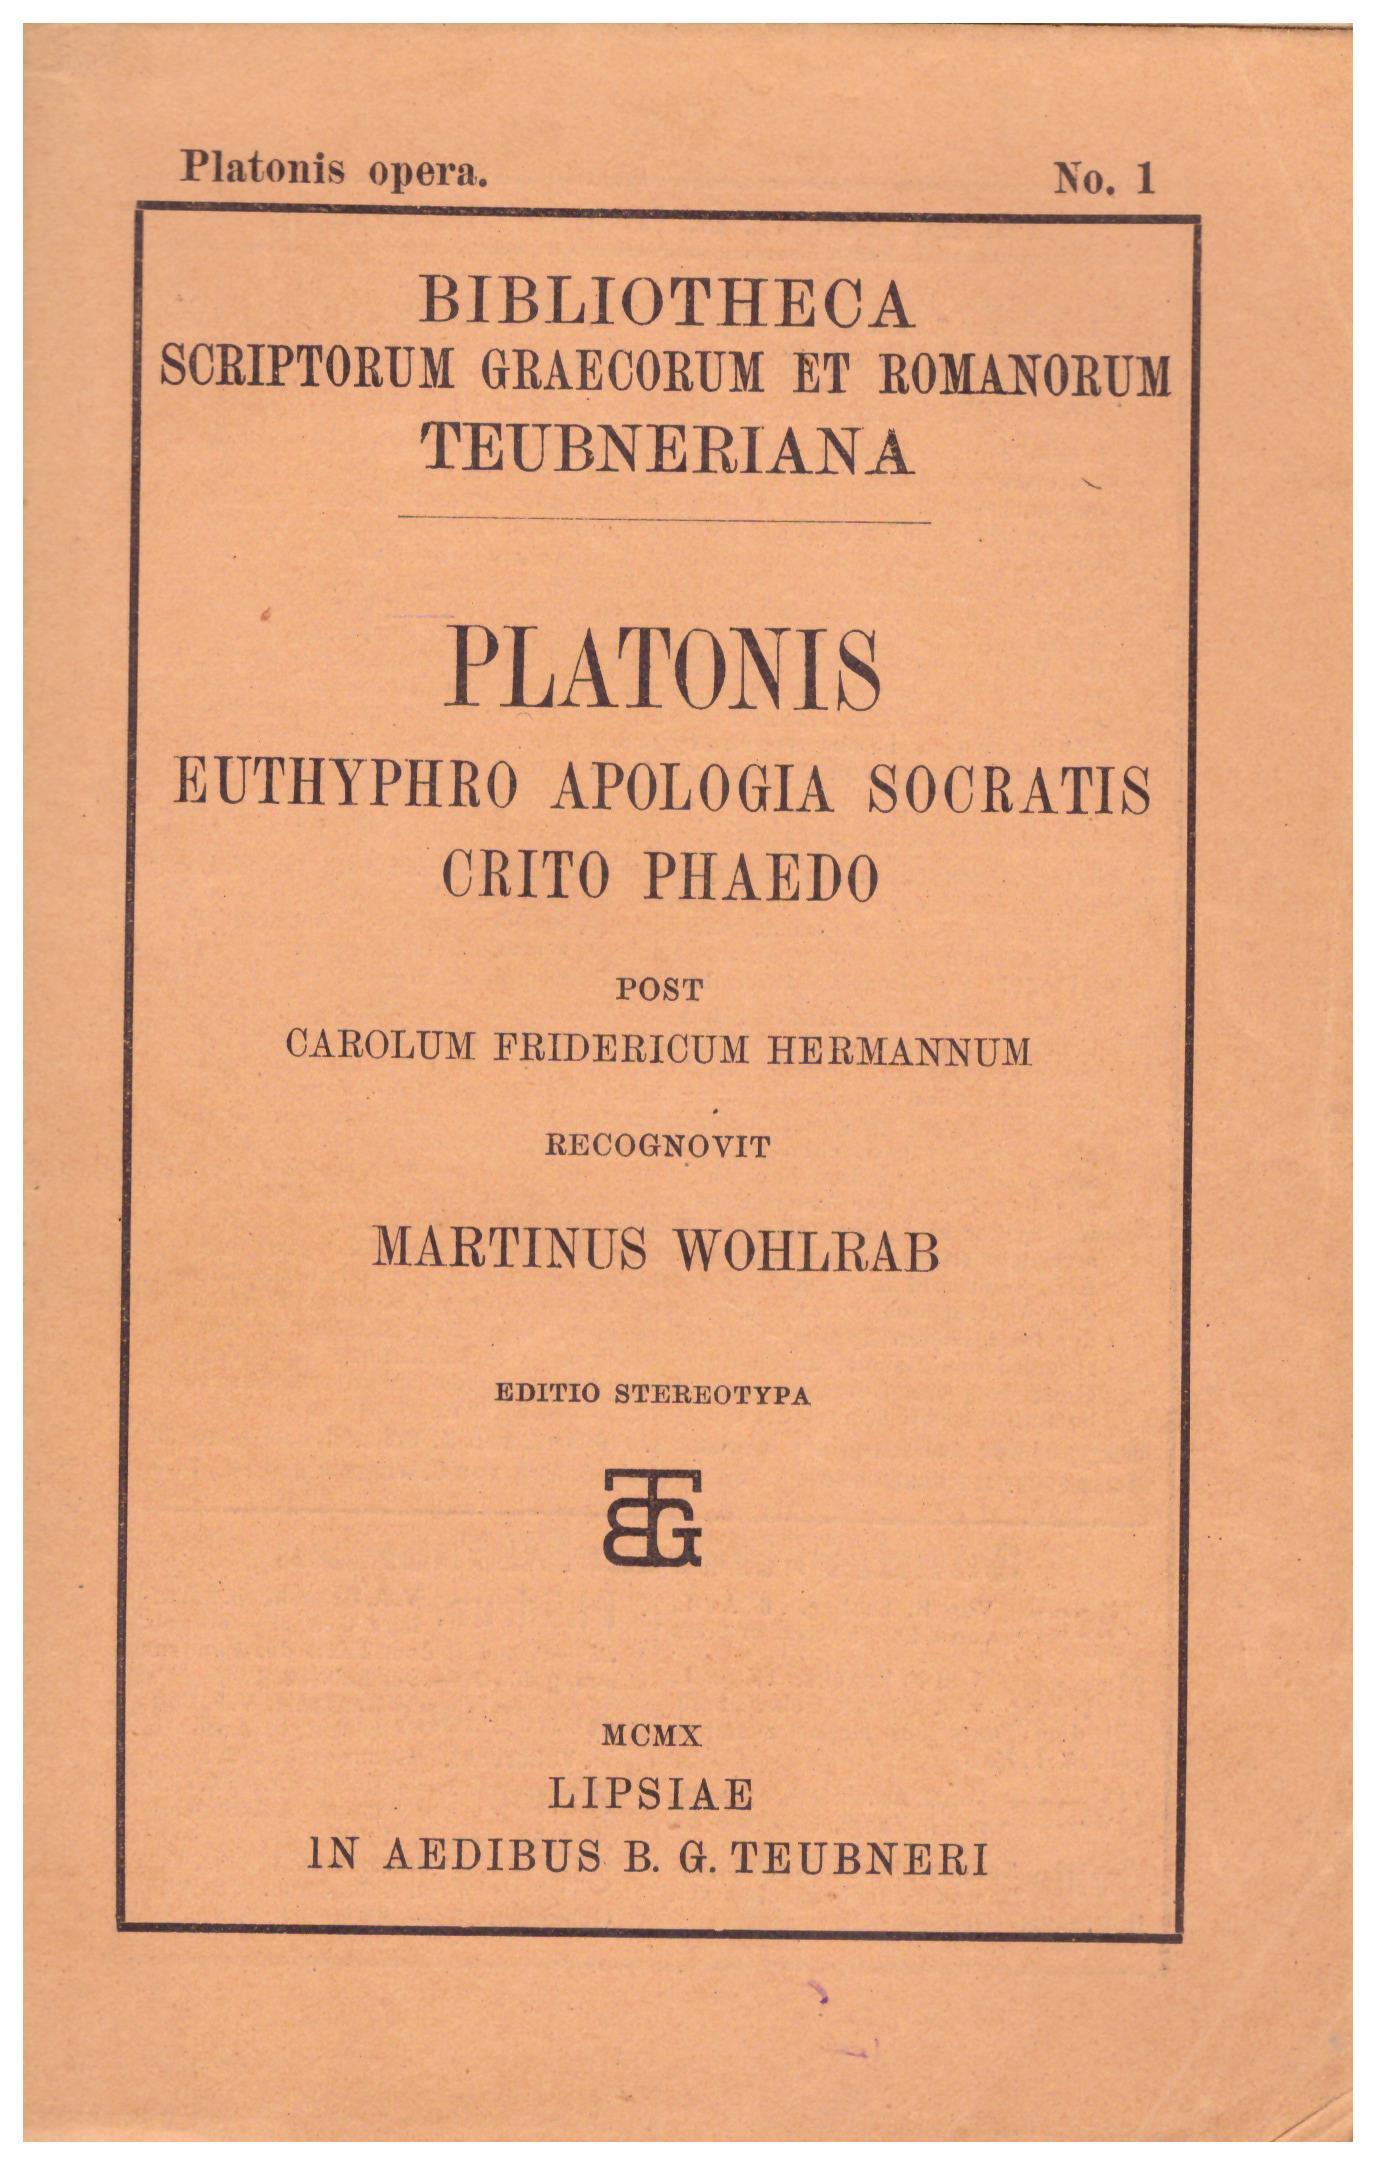 Titolo: Euthyphro, Apologia  Socratis, Crito, Phaedo     Autore: Platone    Editore: Lipsiae in aedibus B. G. Teubneri